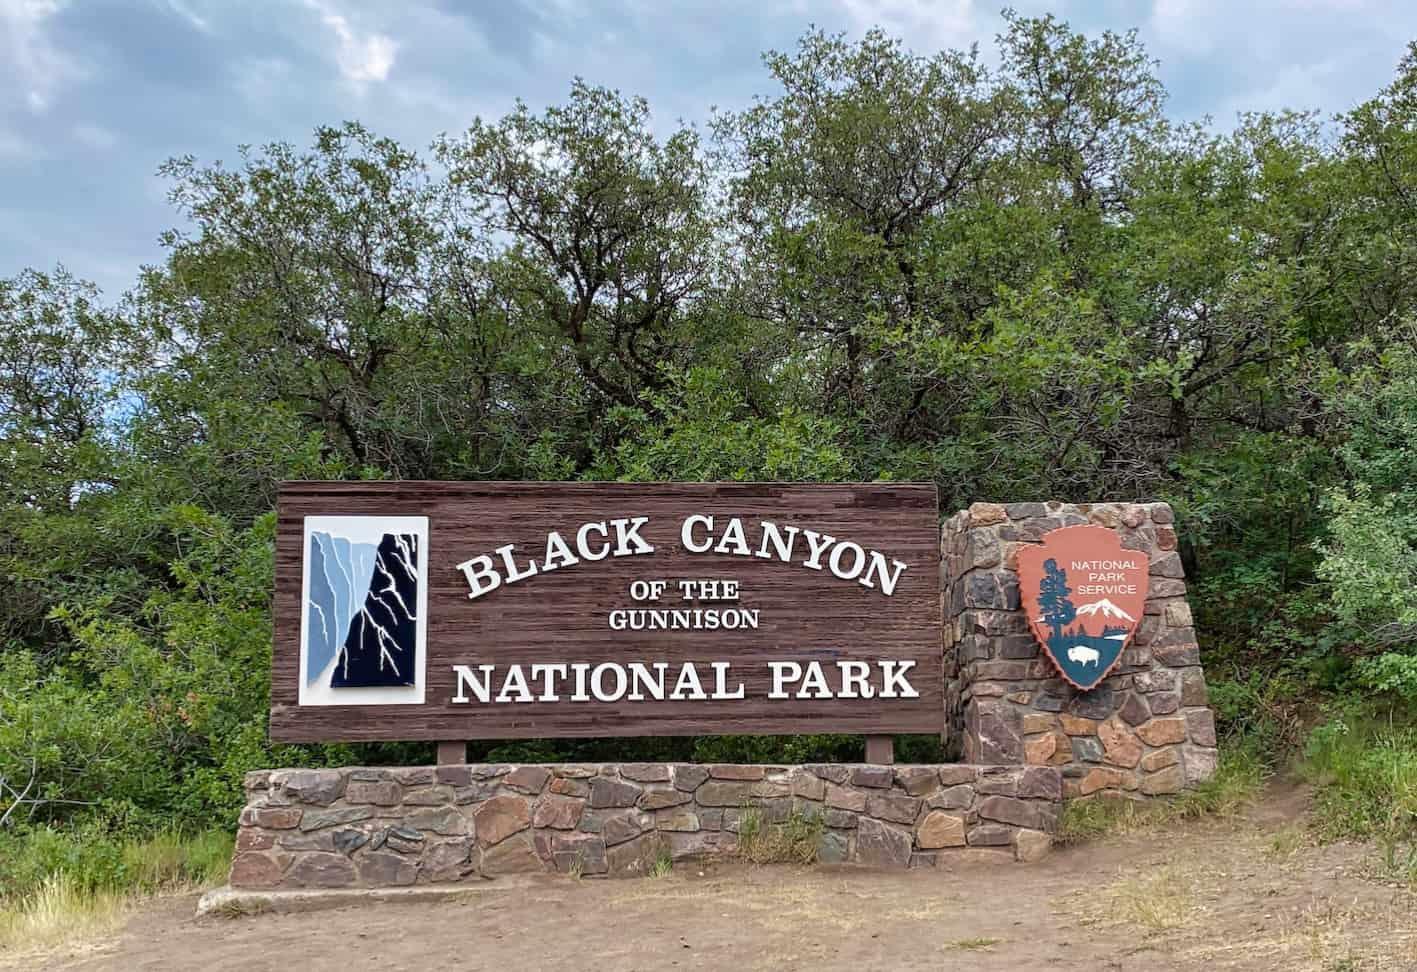 Colarado National Park - Black Canyon of the Gunnison Sign